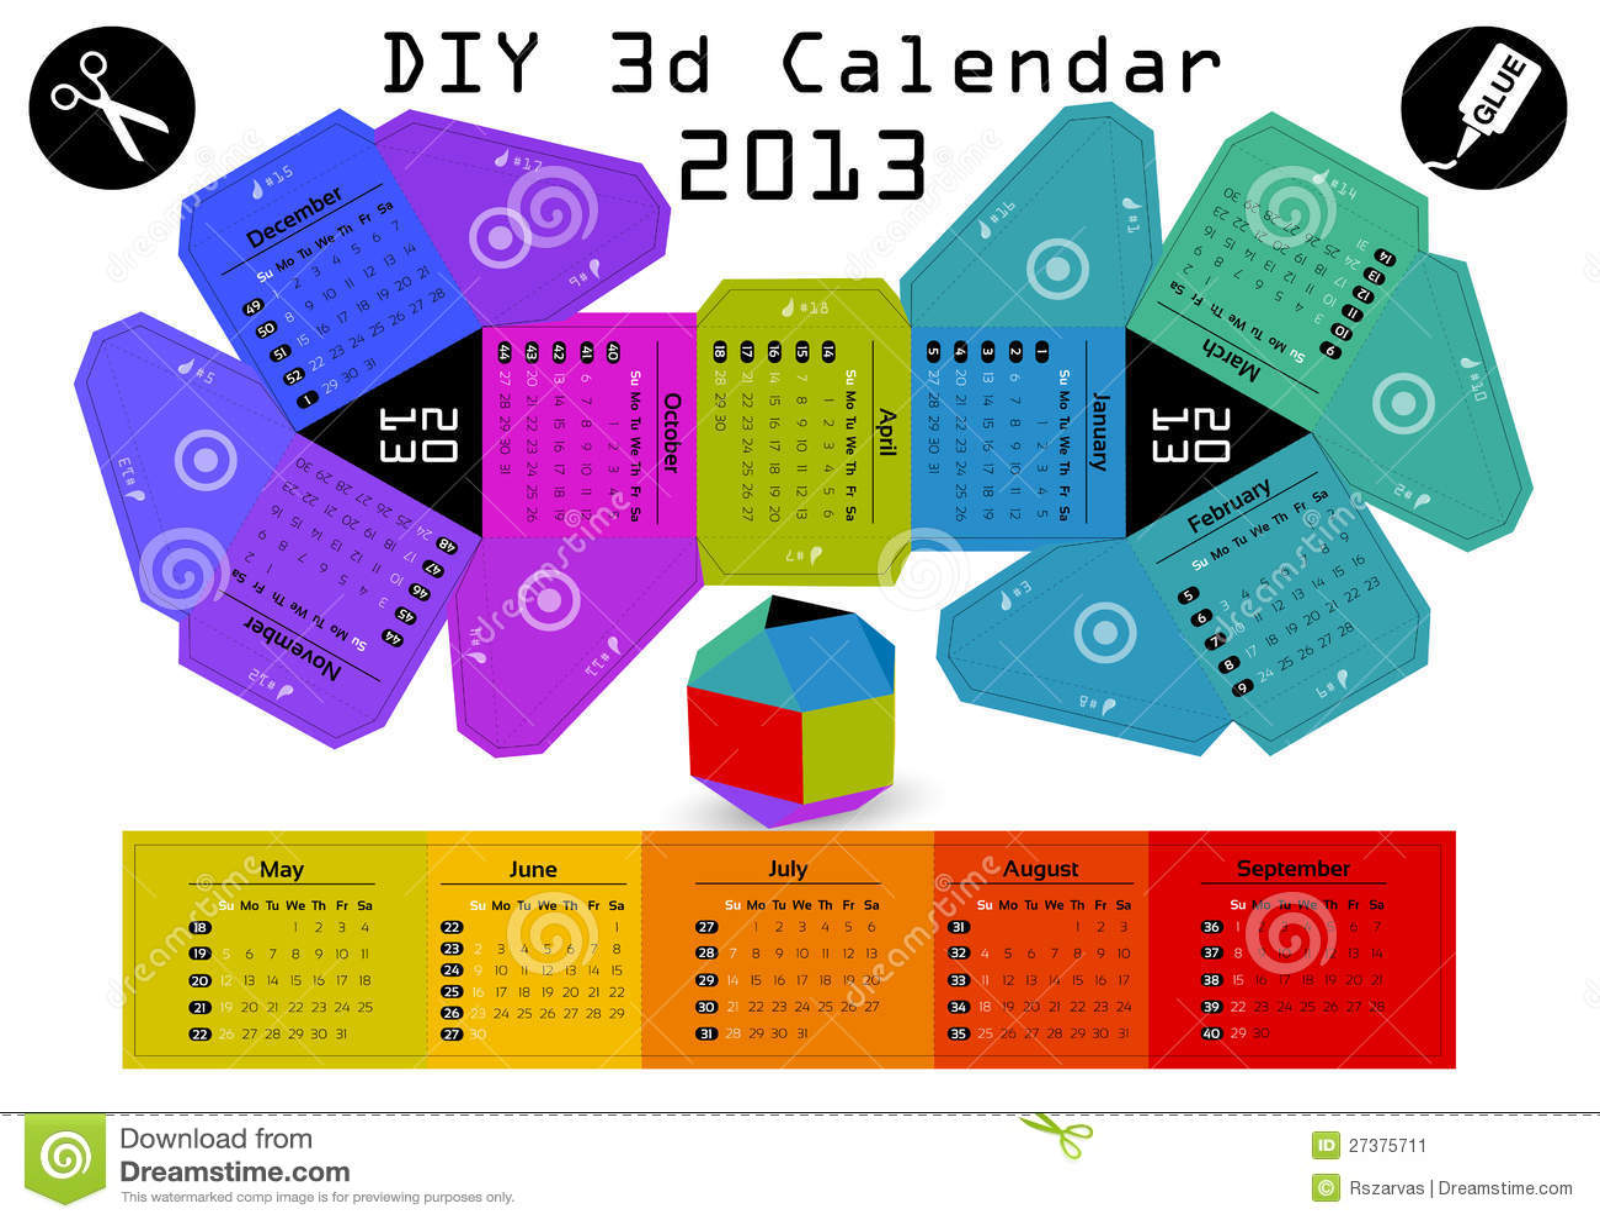 Diy Editorial Calendar : D diy calendar  inch compiled size